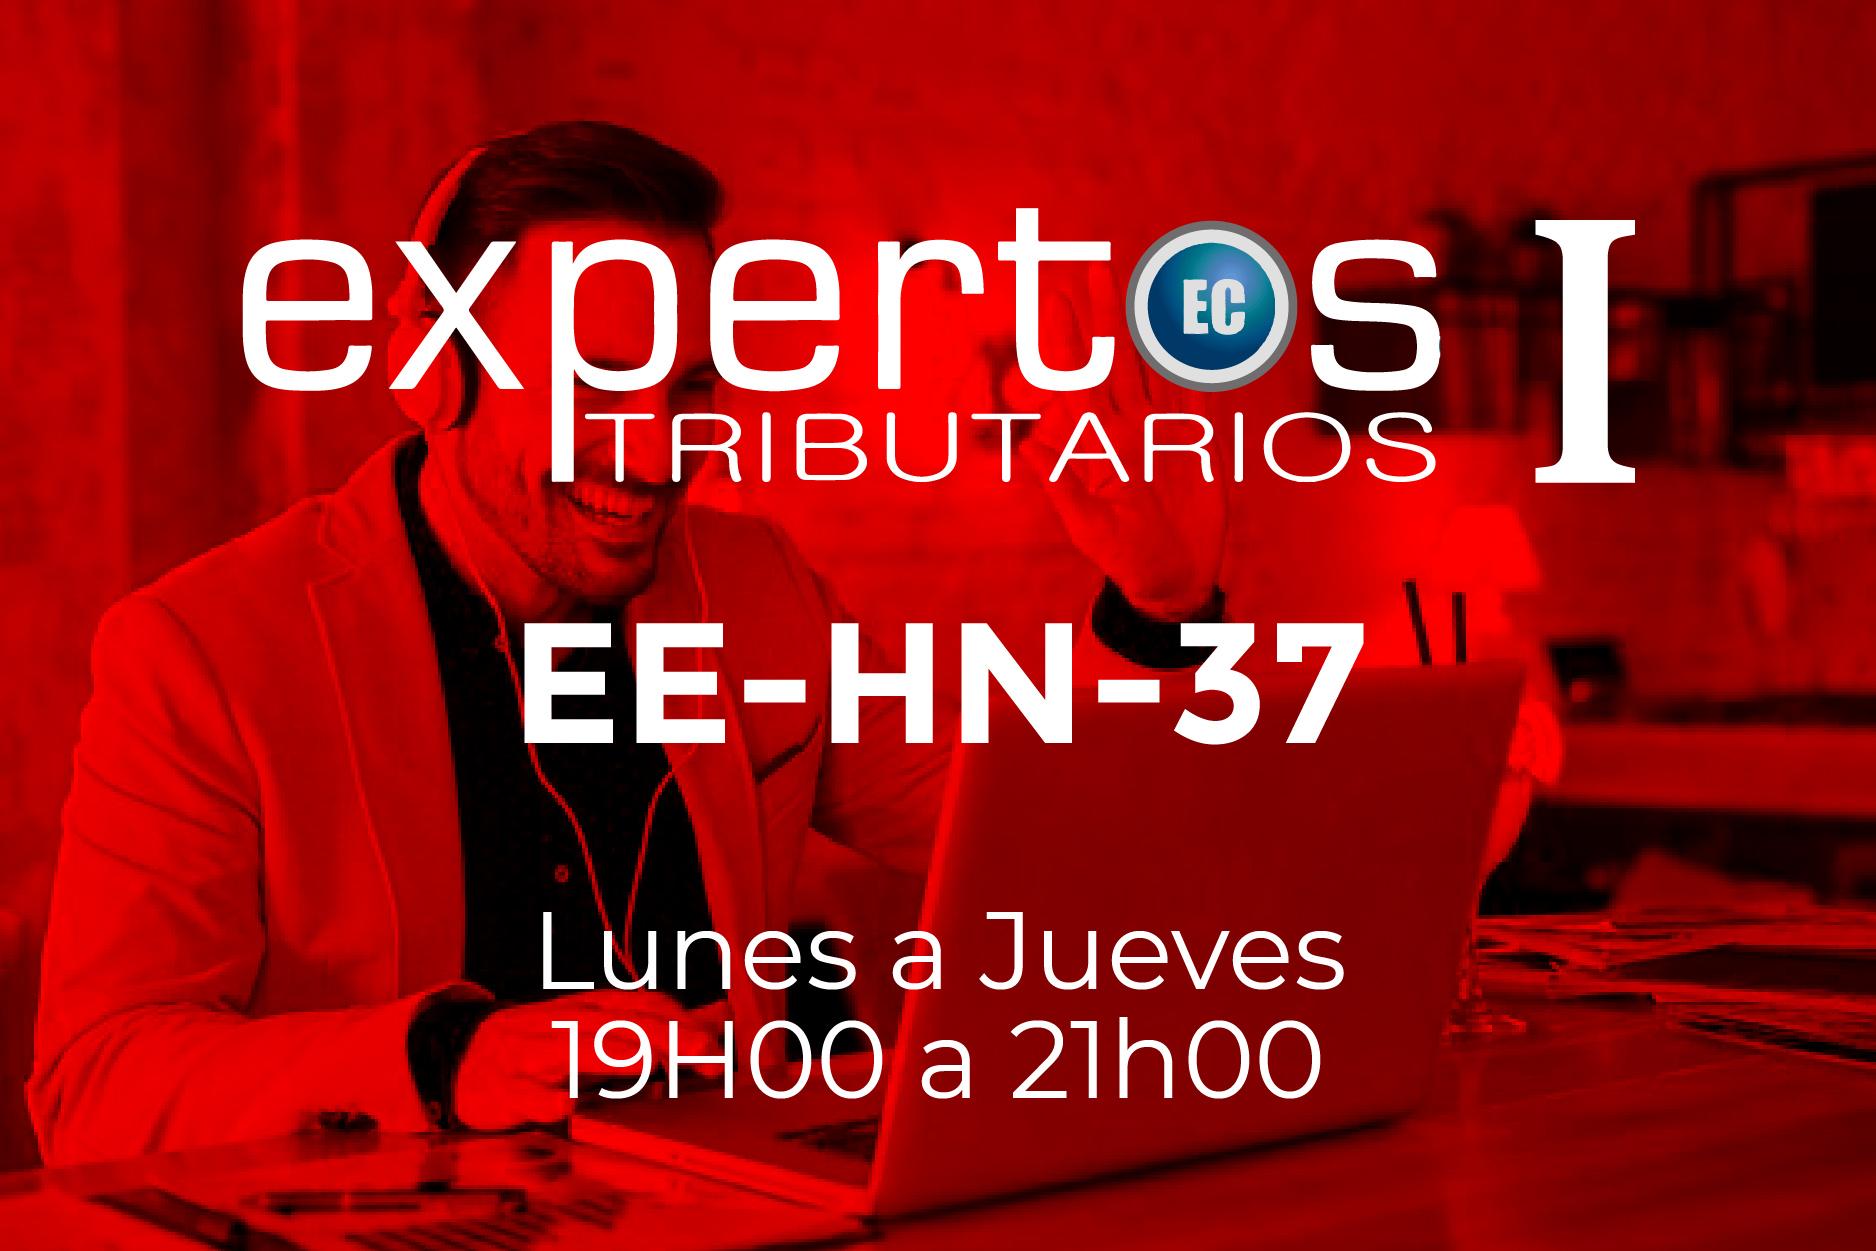 37 - EXPERTOS TRIBUTARIOS - LUNES A JUEVES - 19:00 A 21:00